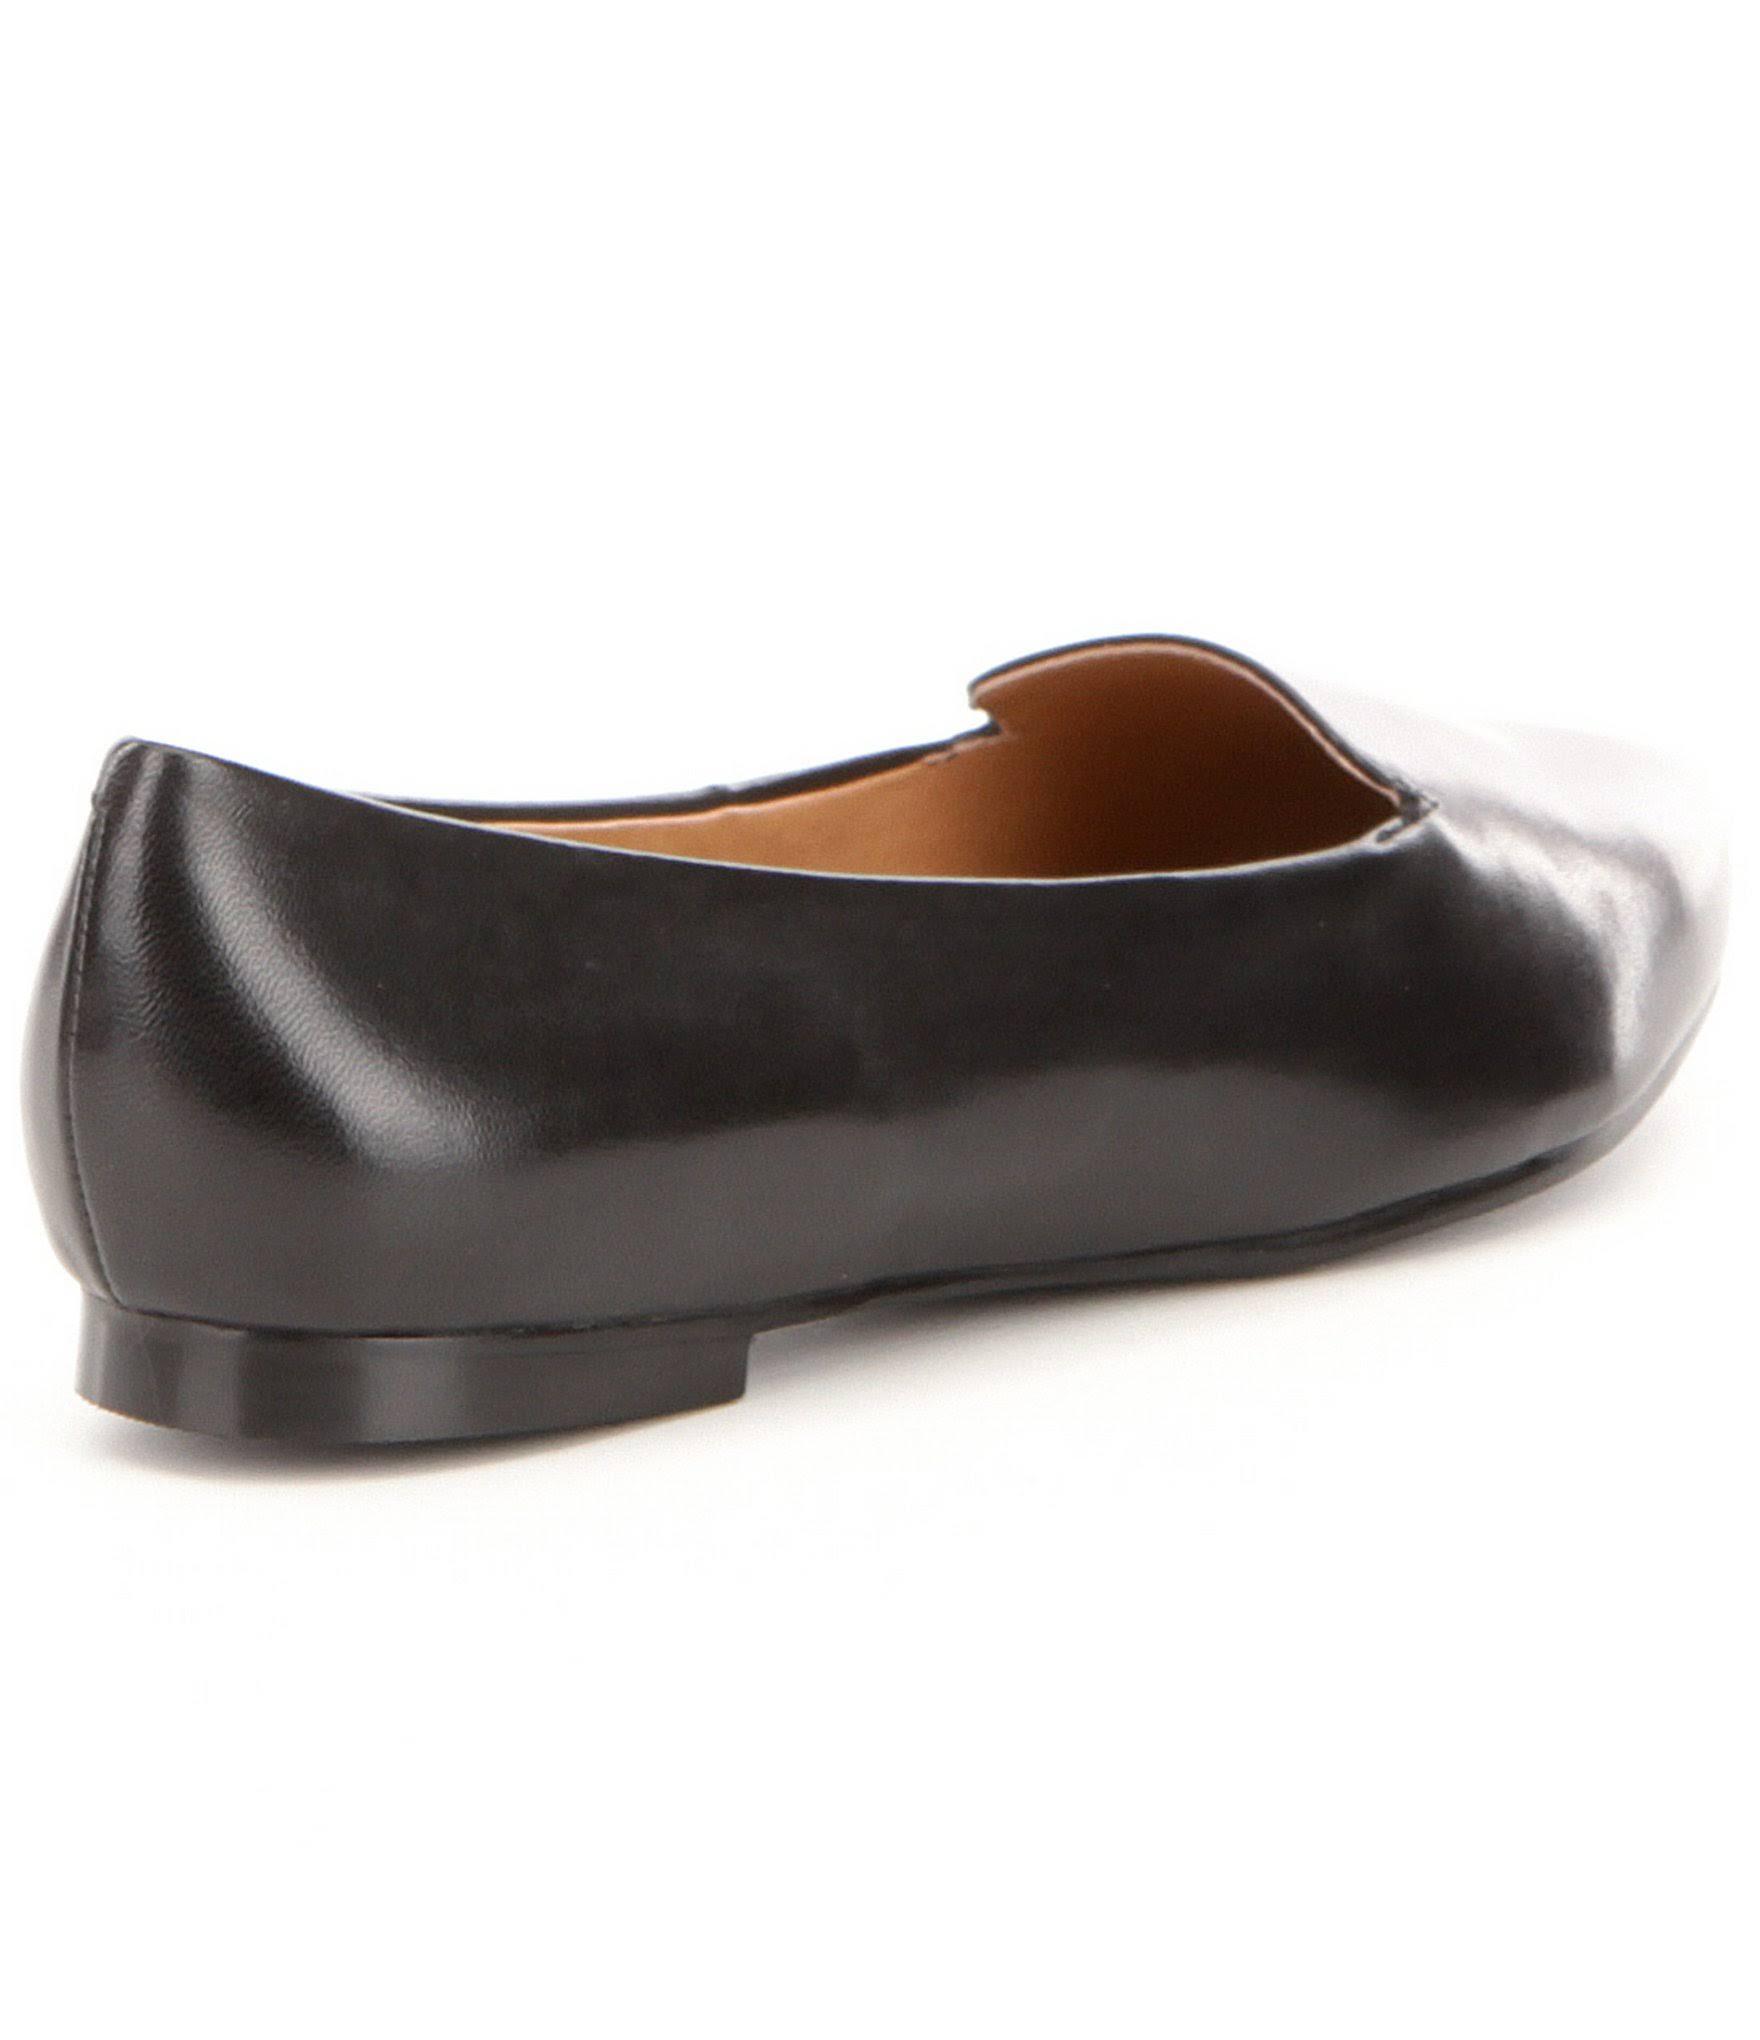 LoaferDames zwart LoaferDames Trotters leer Trotters Harlowe Harlowe zwart leer 80nOPwk